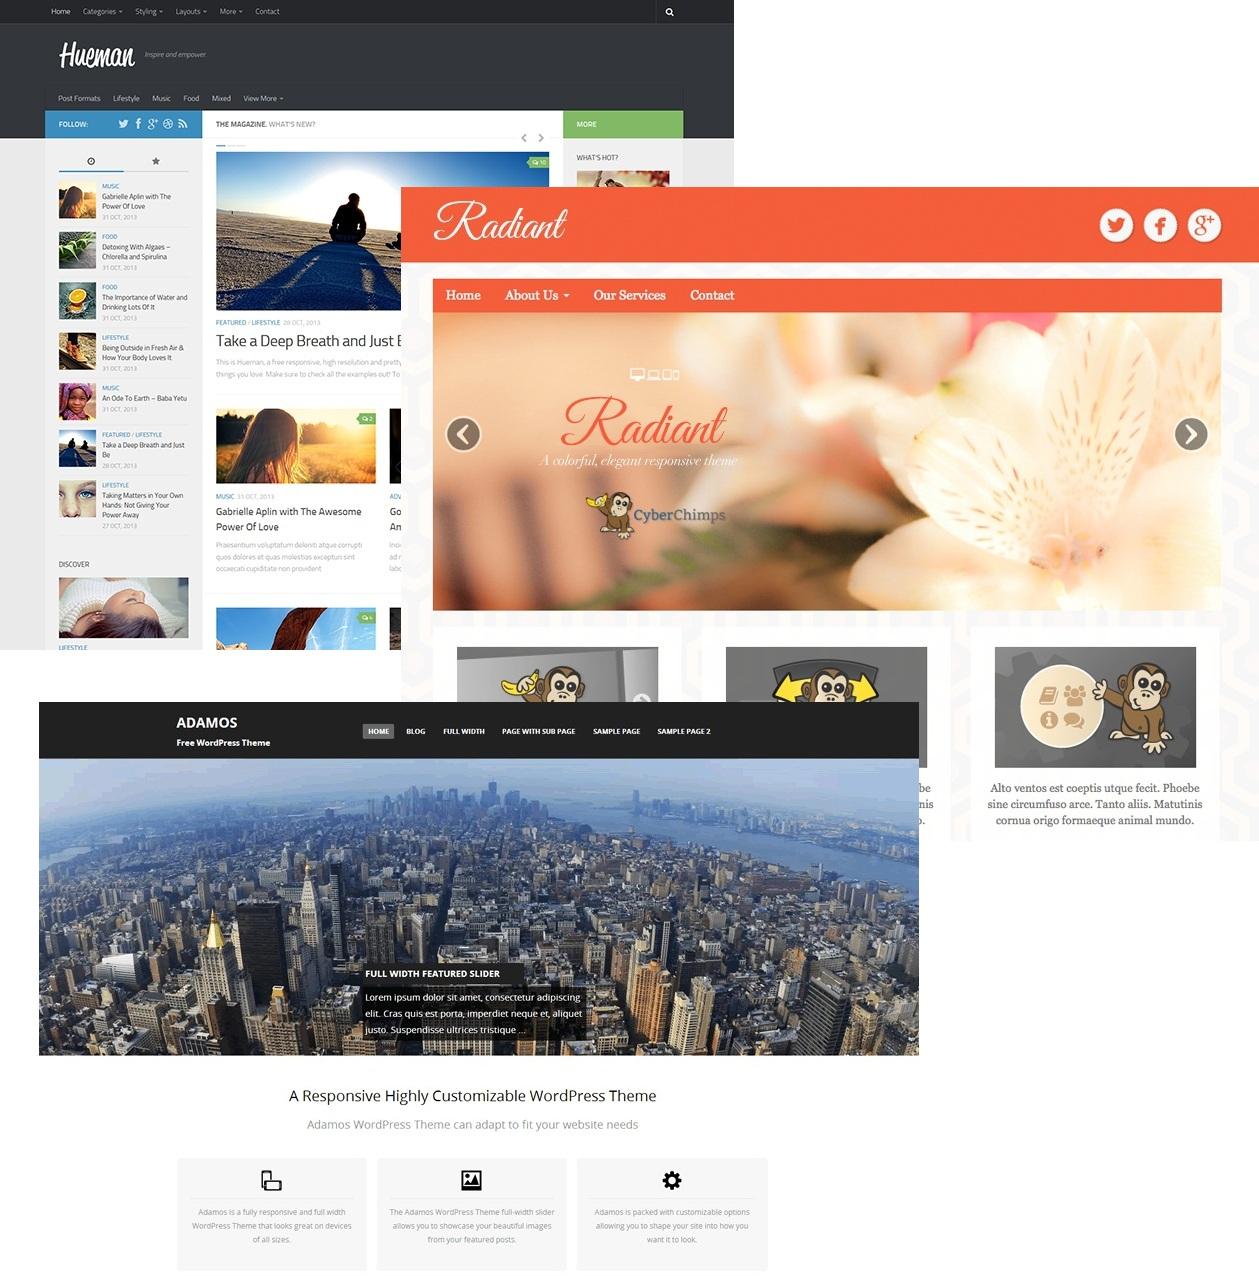 Tema Responsivo para Wordpress